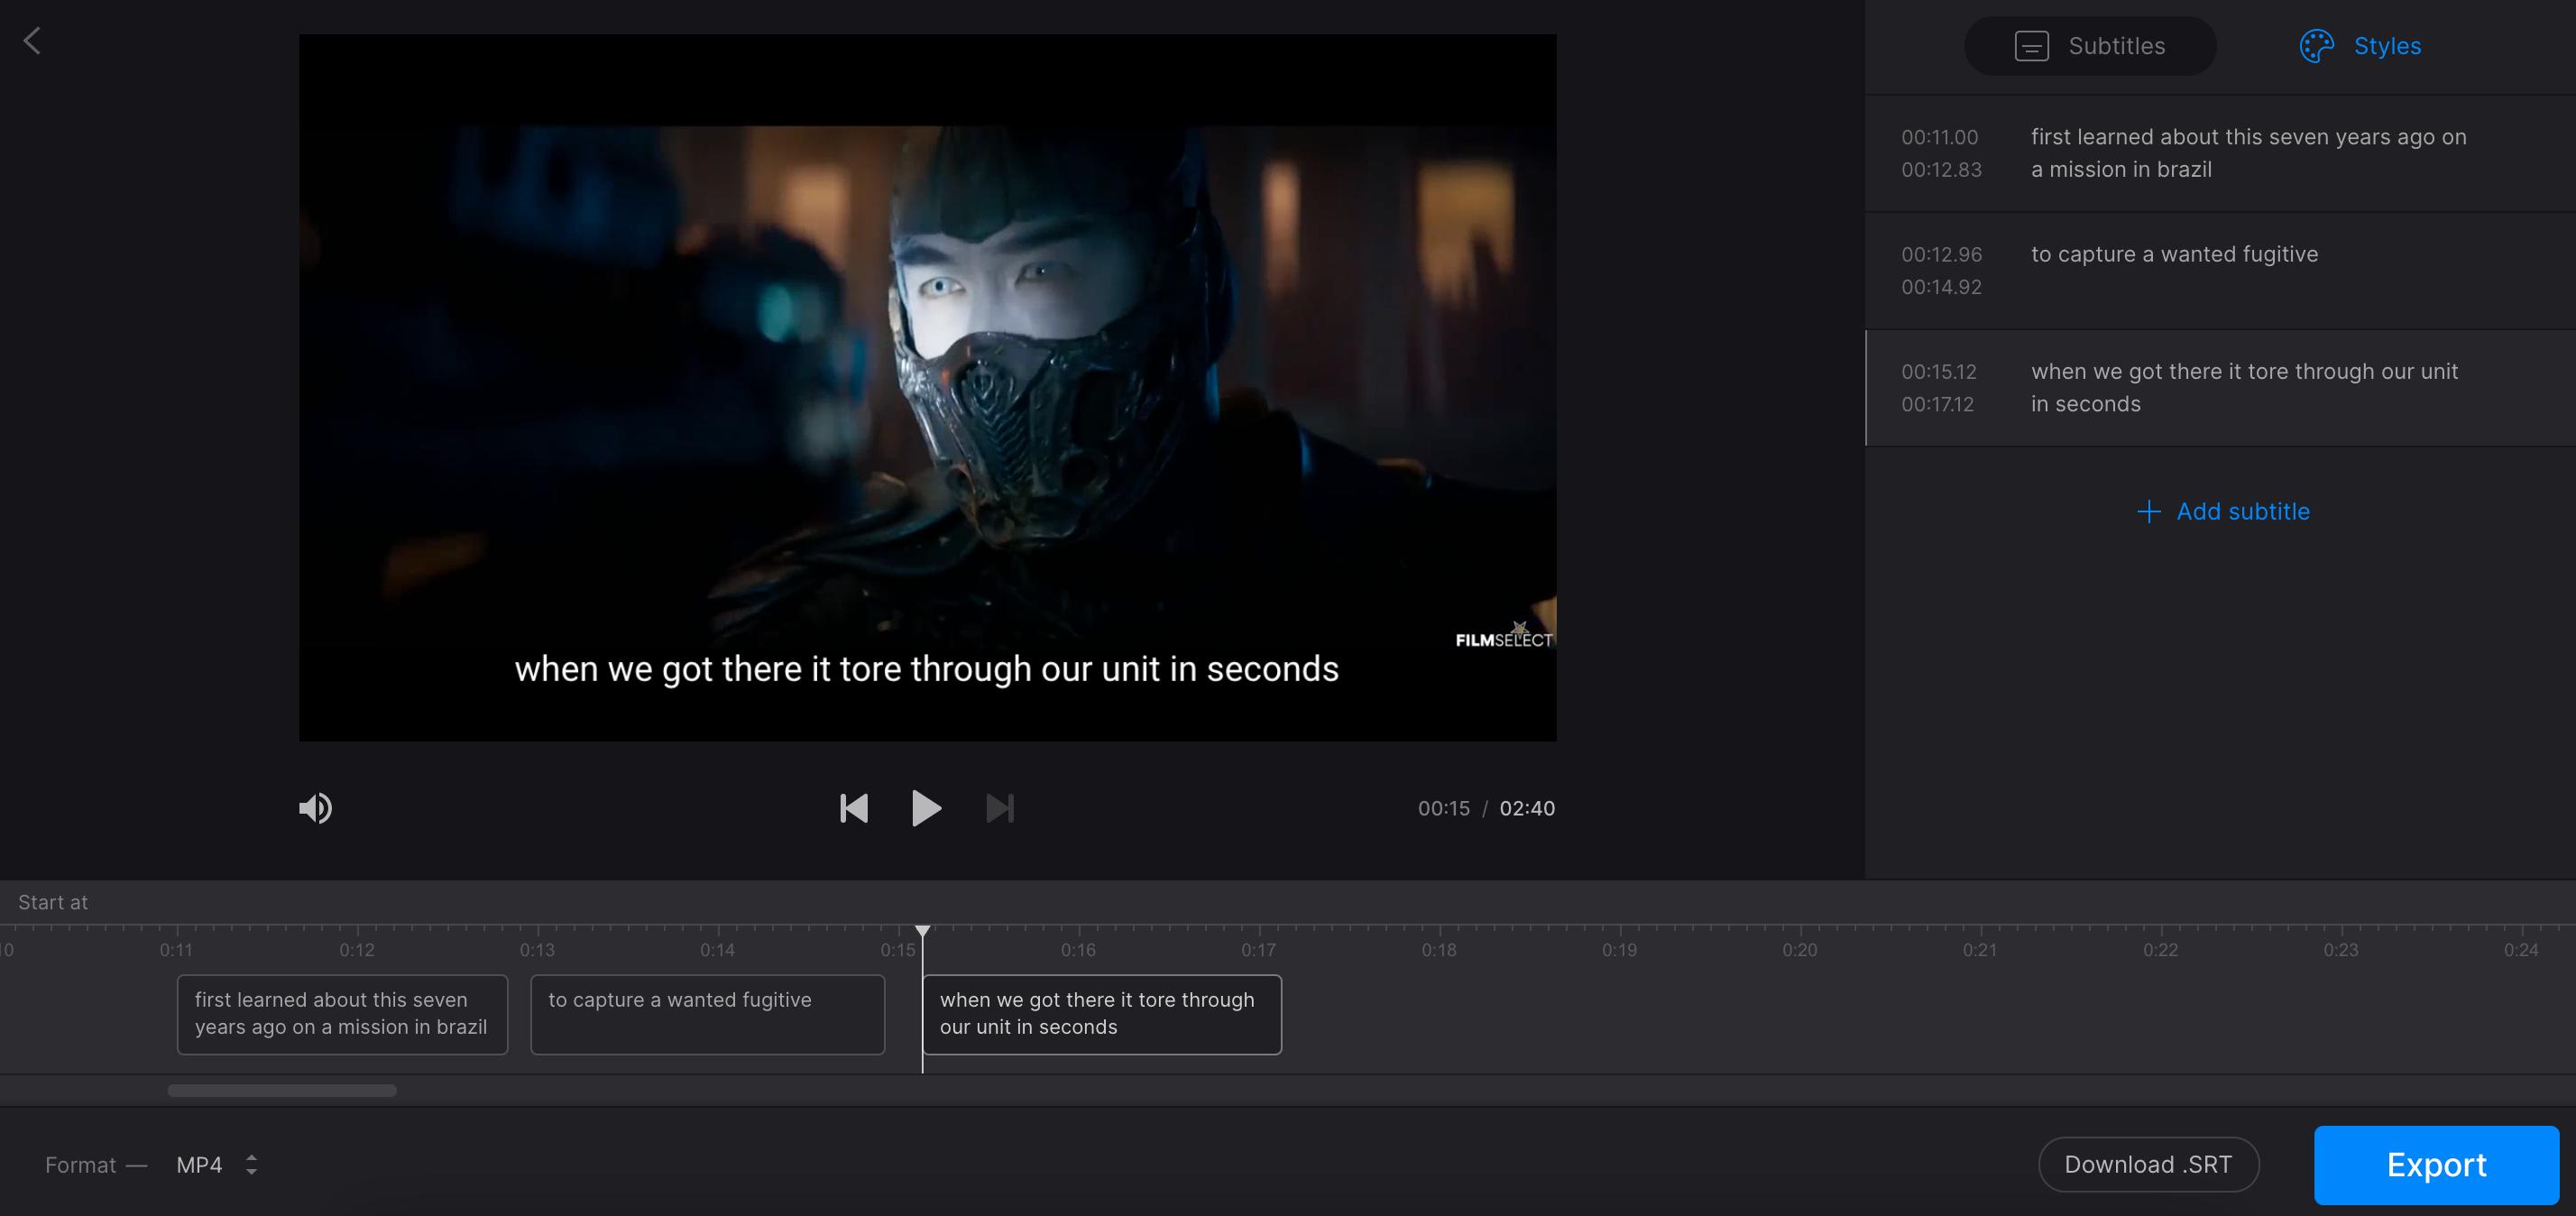 Add subtitles as dubbing alternative